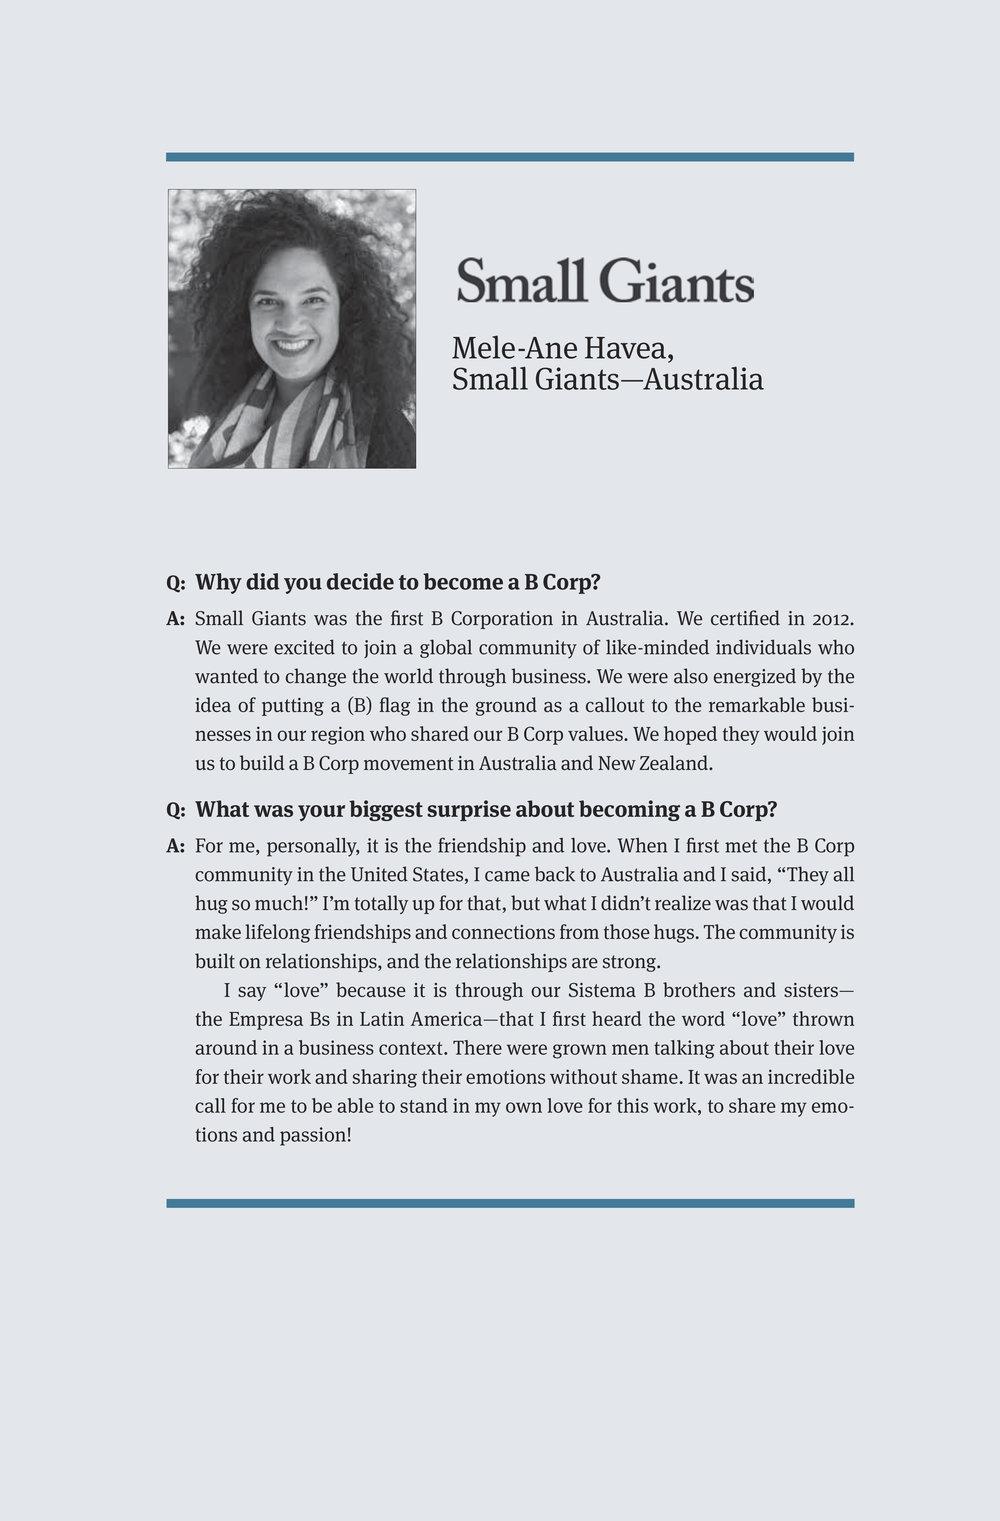 Mele-Ane Havea (Small Giants).jpg